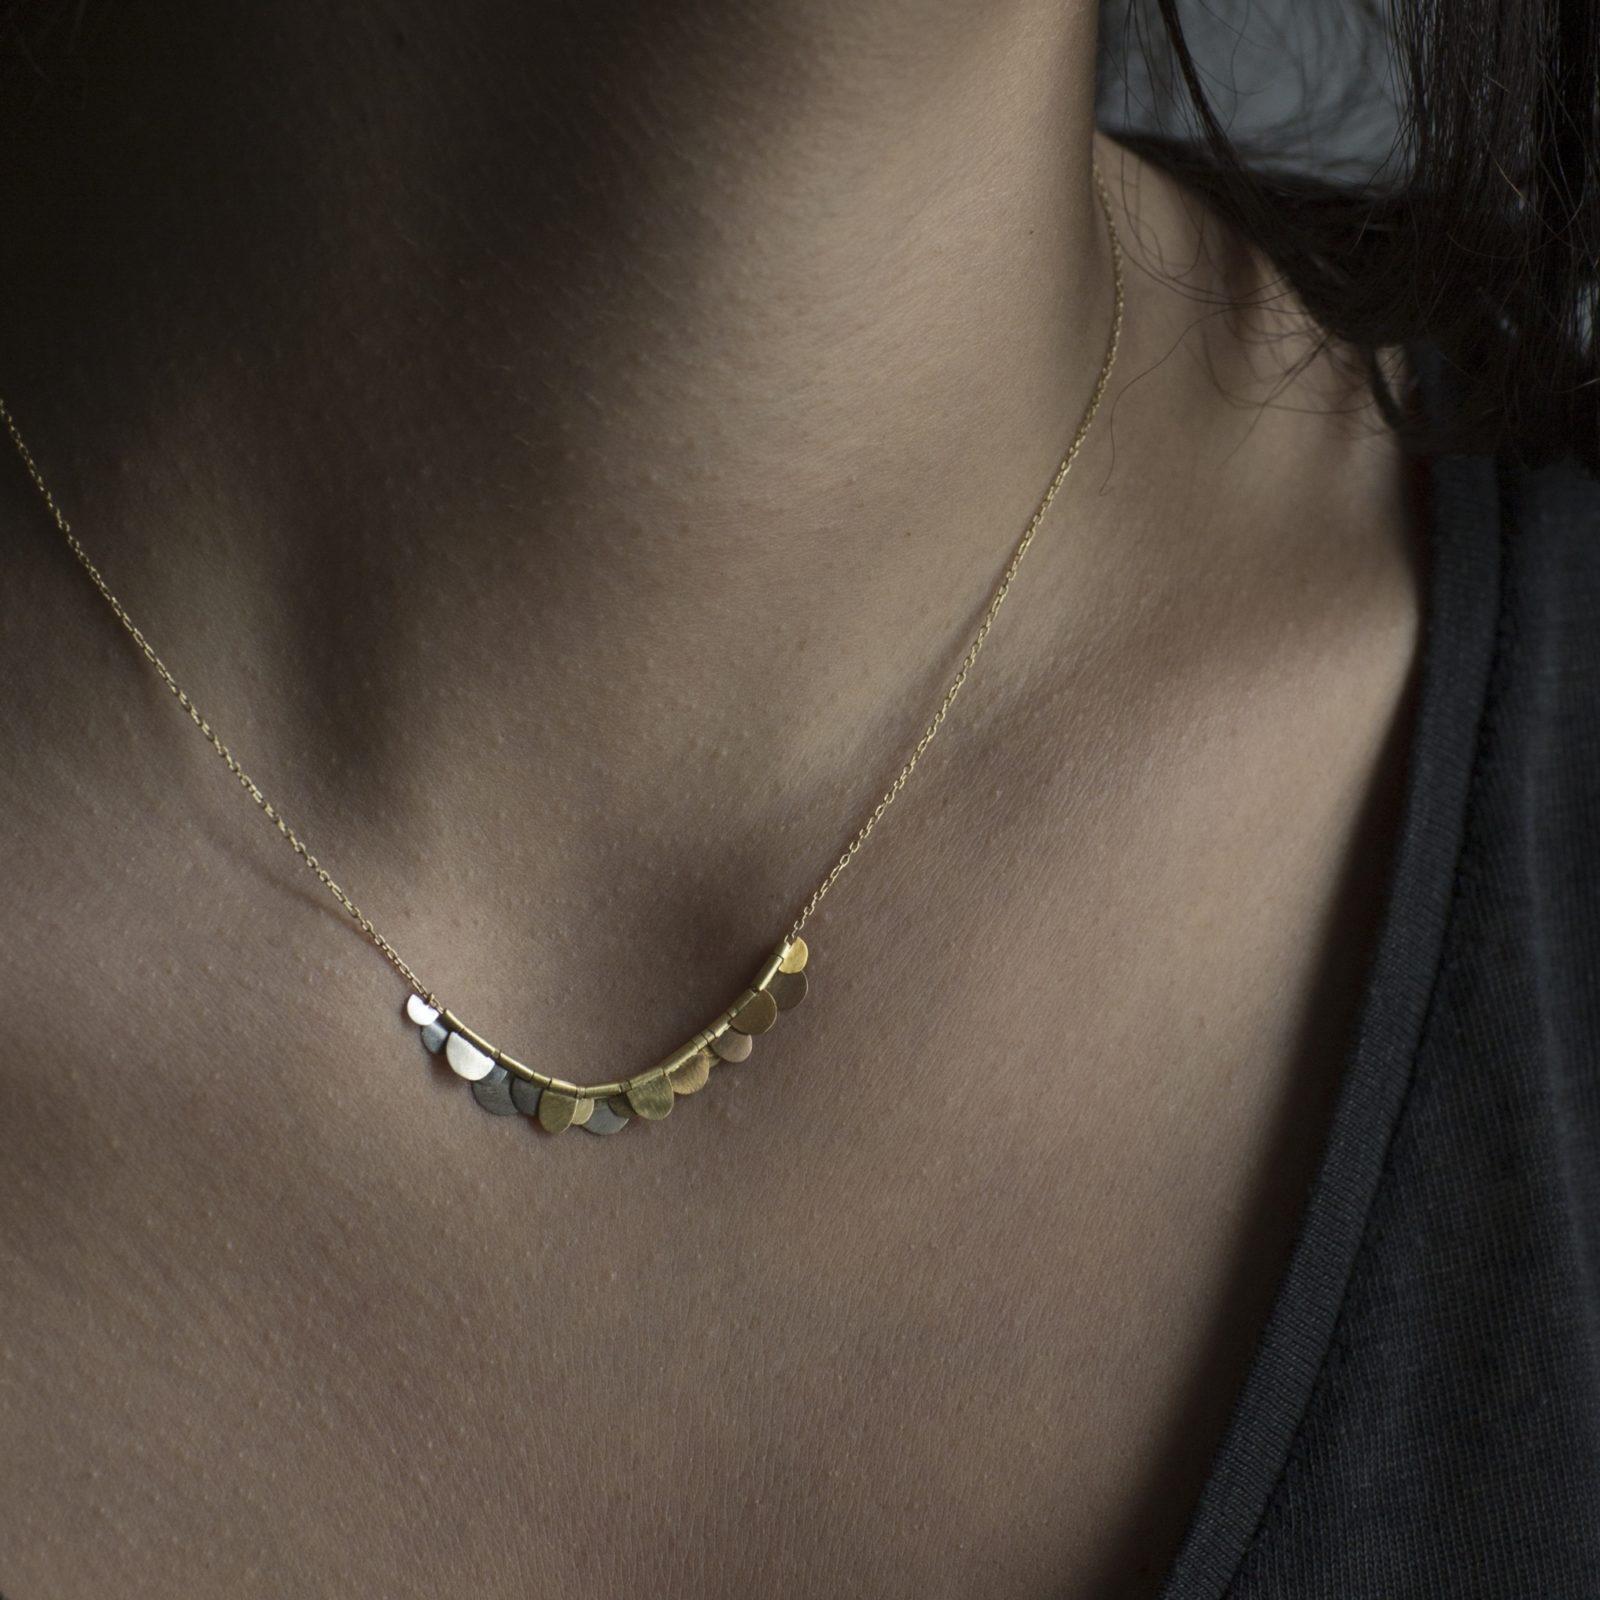 Sia Taylor KN2 YRAIN Rainbow Golds Flora Necklace M